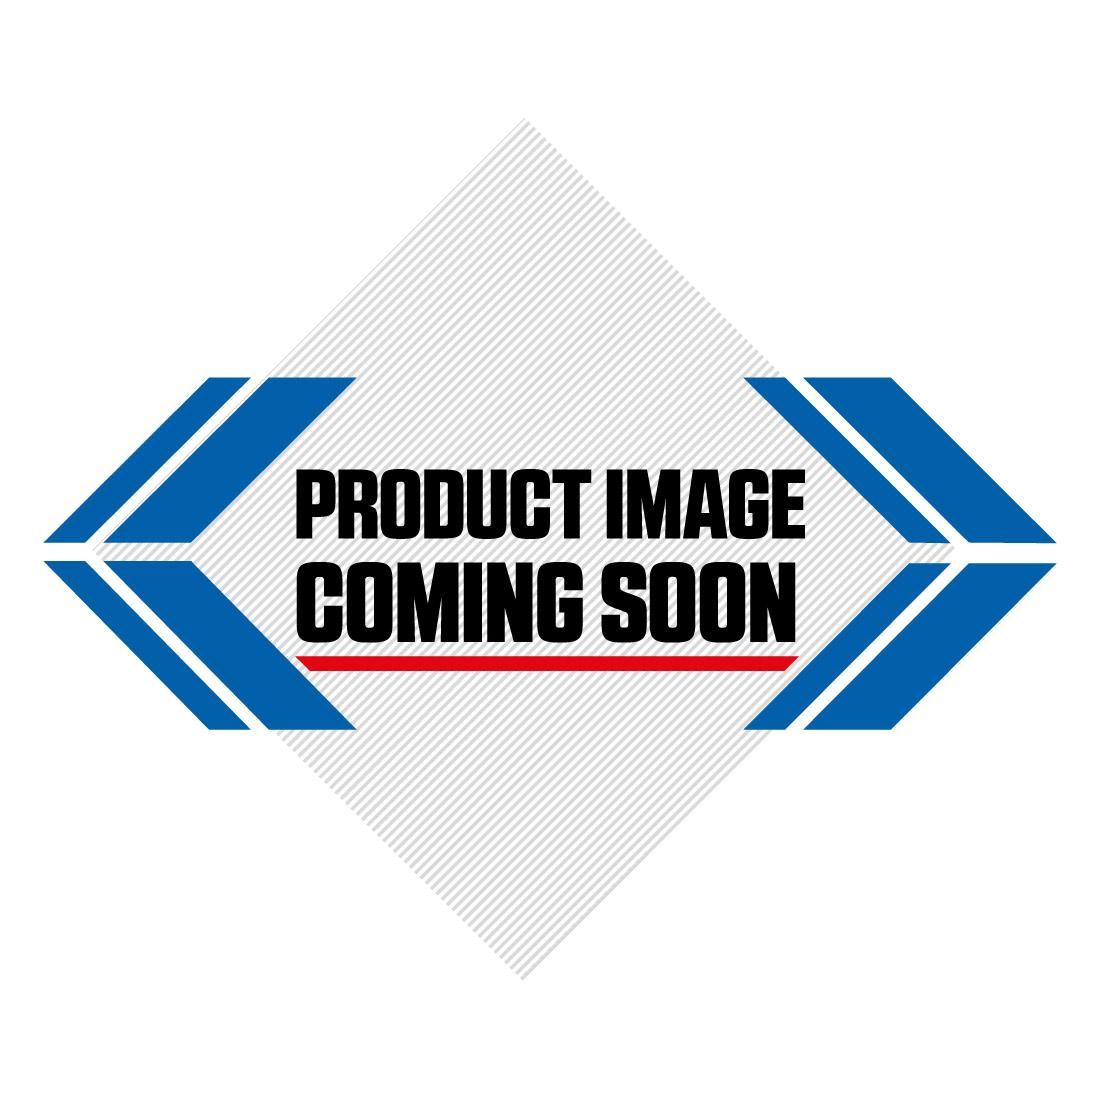 Suzuki Plastic Kit RMZ 450 (11-12) OEM Factory Image-5>